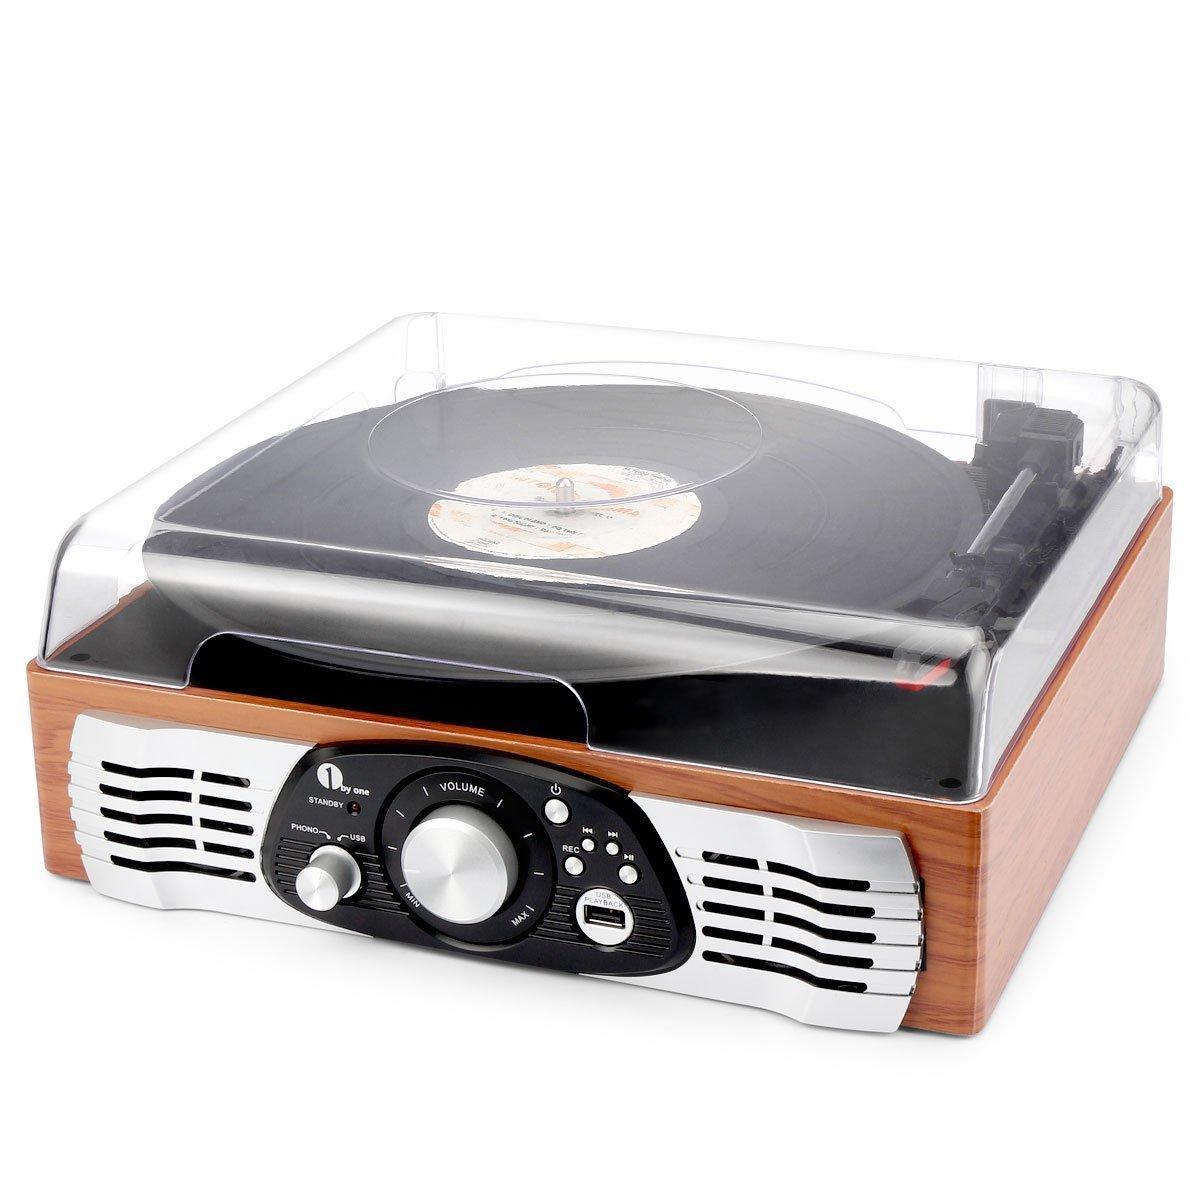 Amazon.com: 1byone Belt Drive - Tocadiscos estéreo de 3 ...